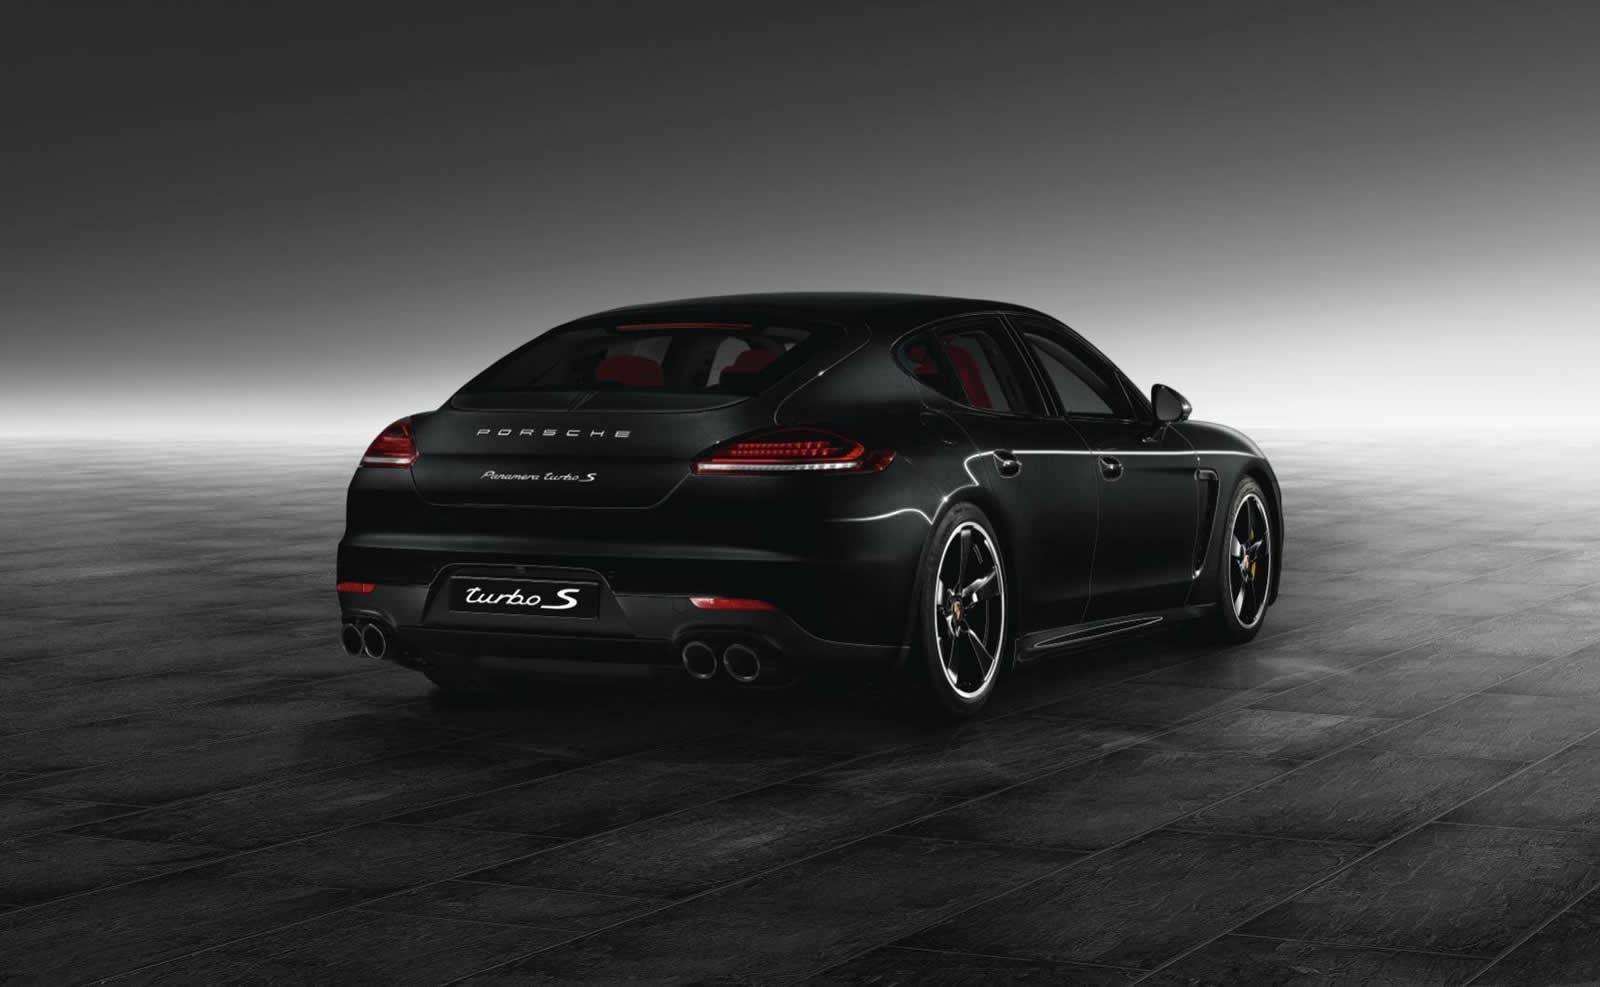 2015 Porsche Exclusive Panamera Turbo S 4